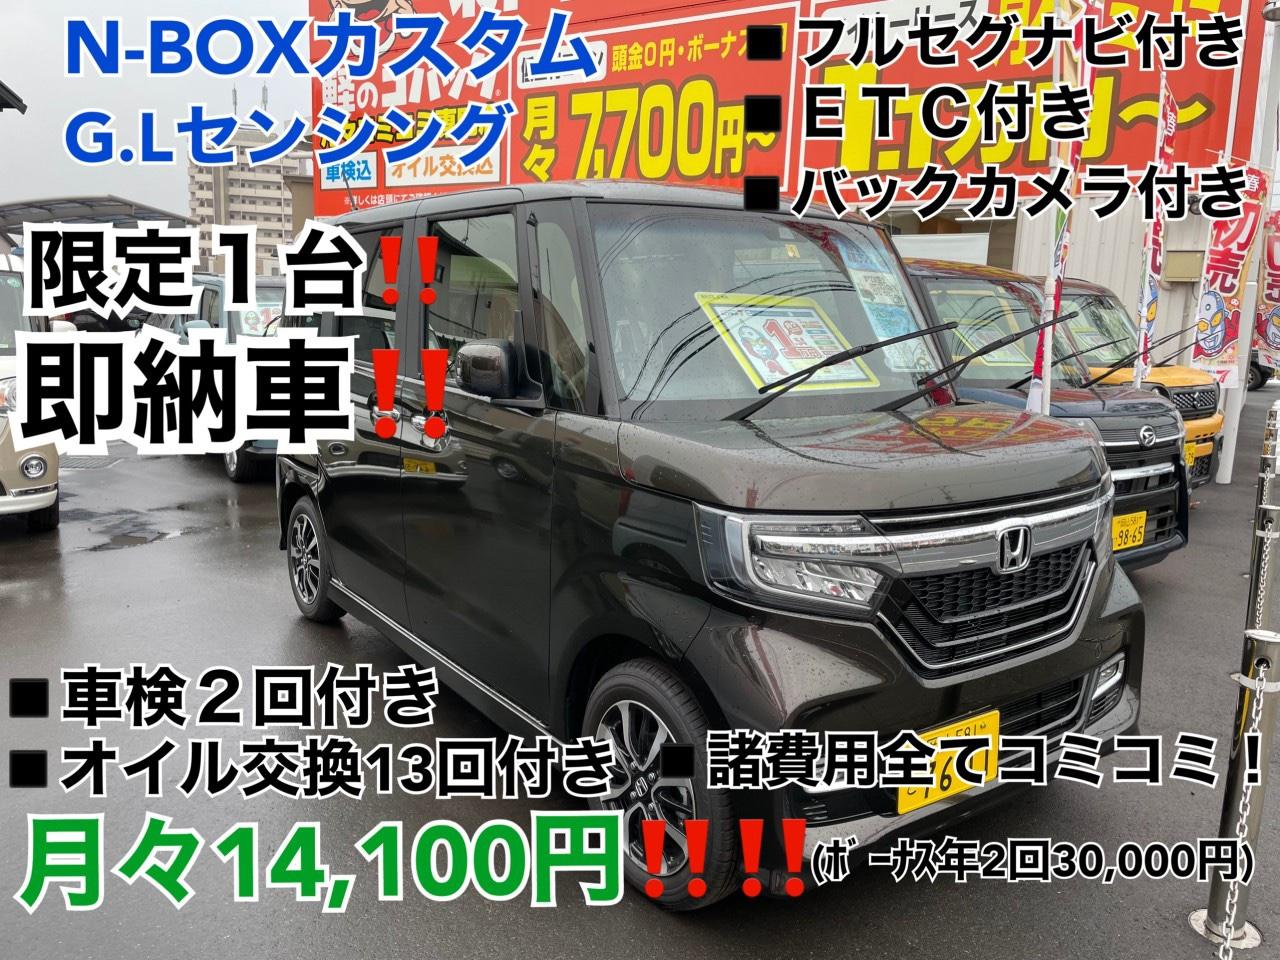 N-BOXカスタム1台限定即納車が出来ます!